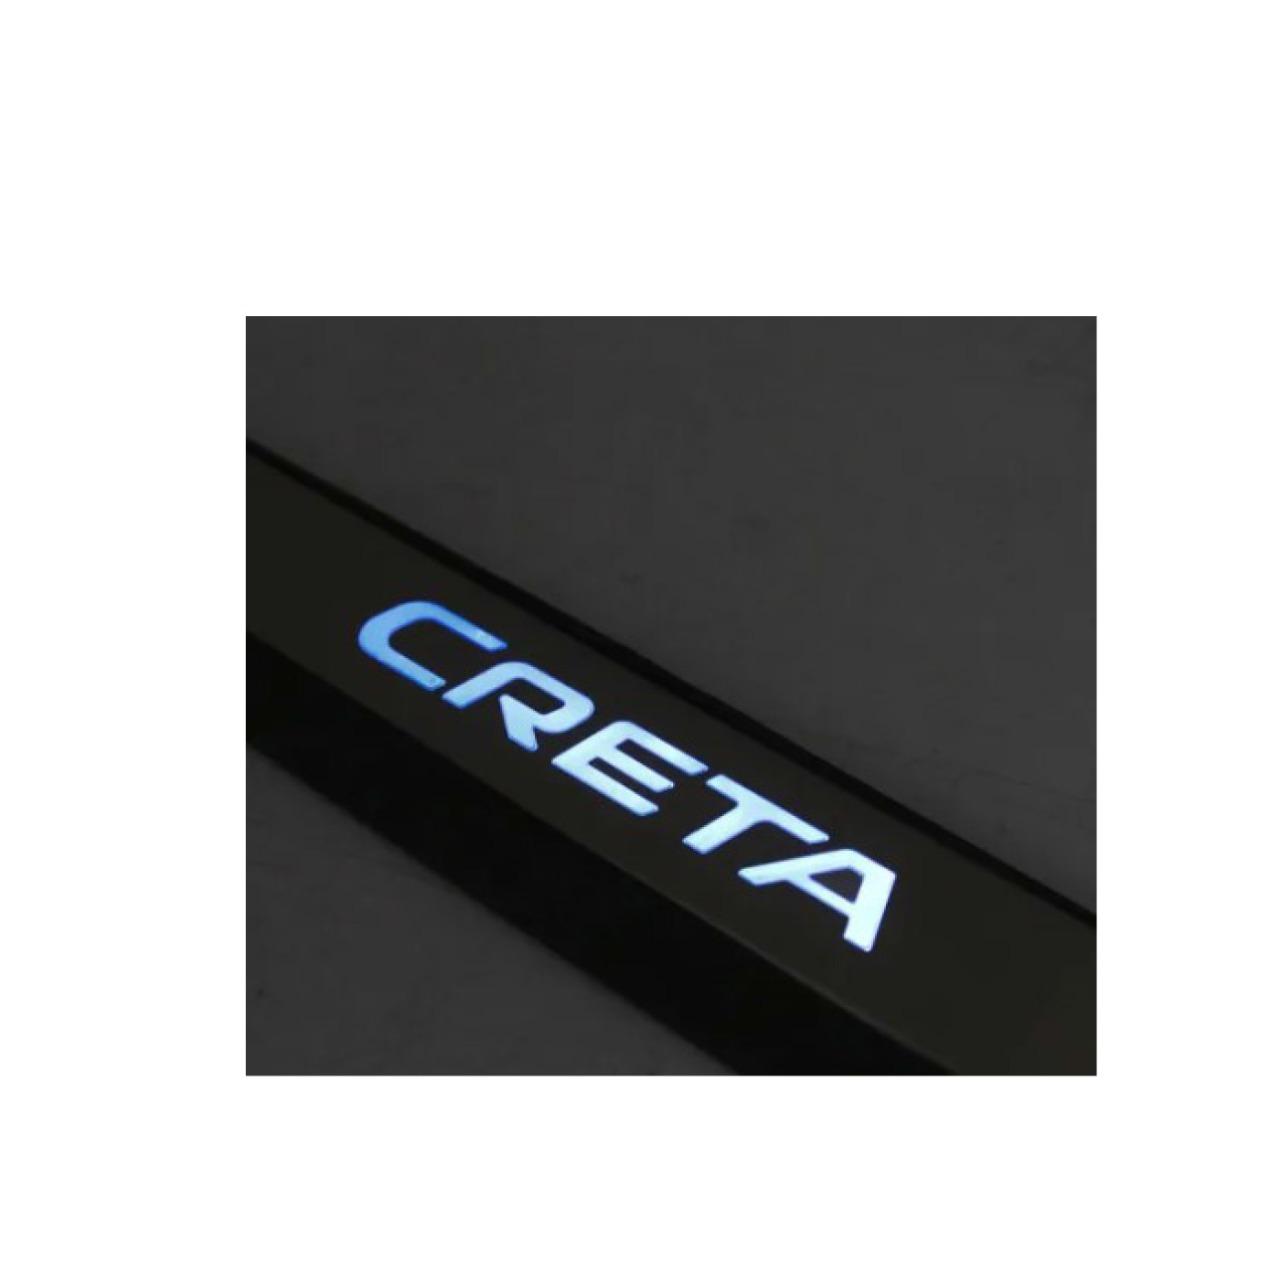 Kit Soleira de Porta C/ LED Creta Inox Iluminada